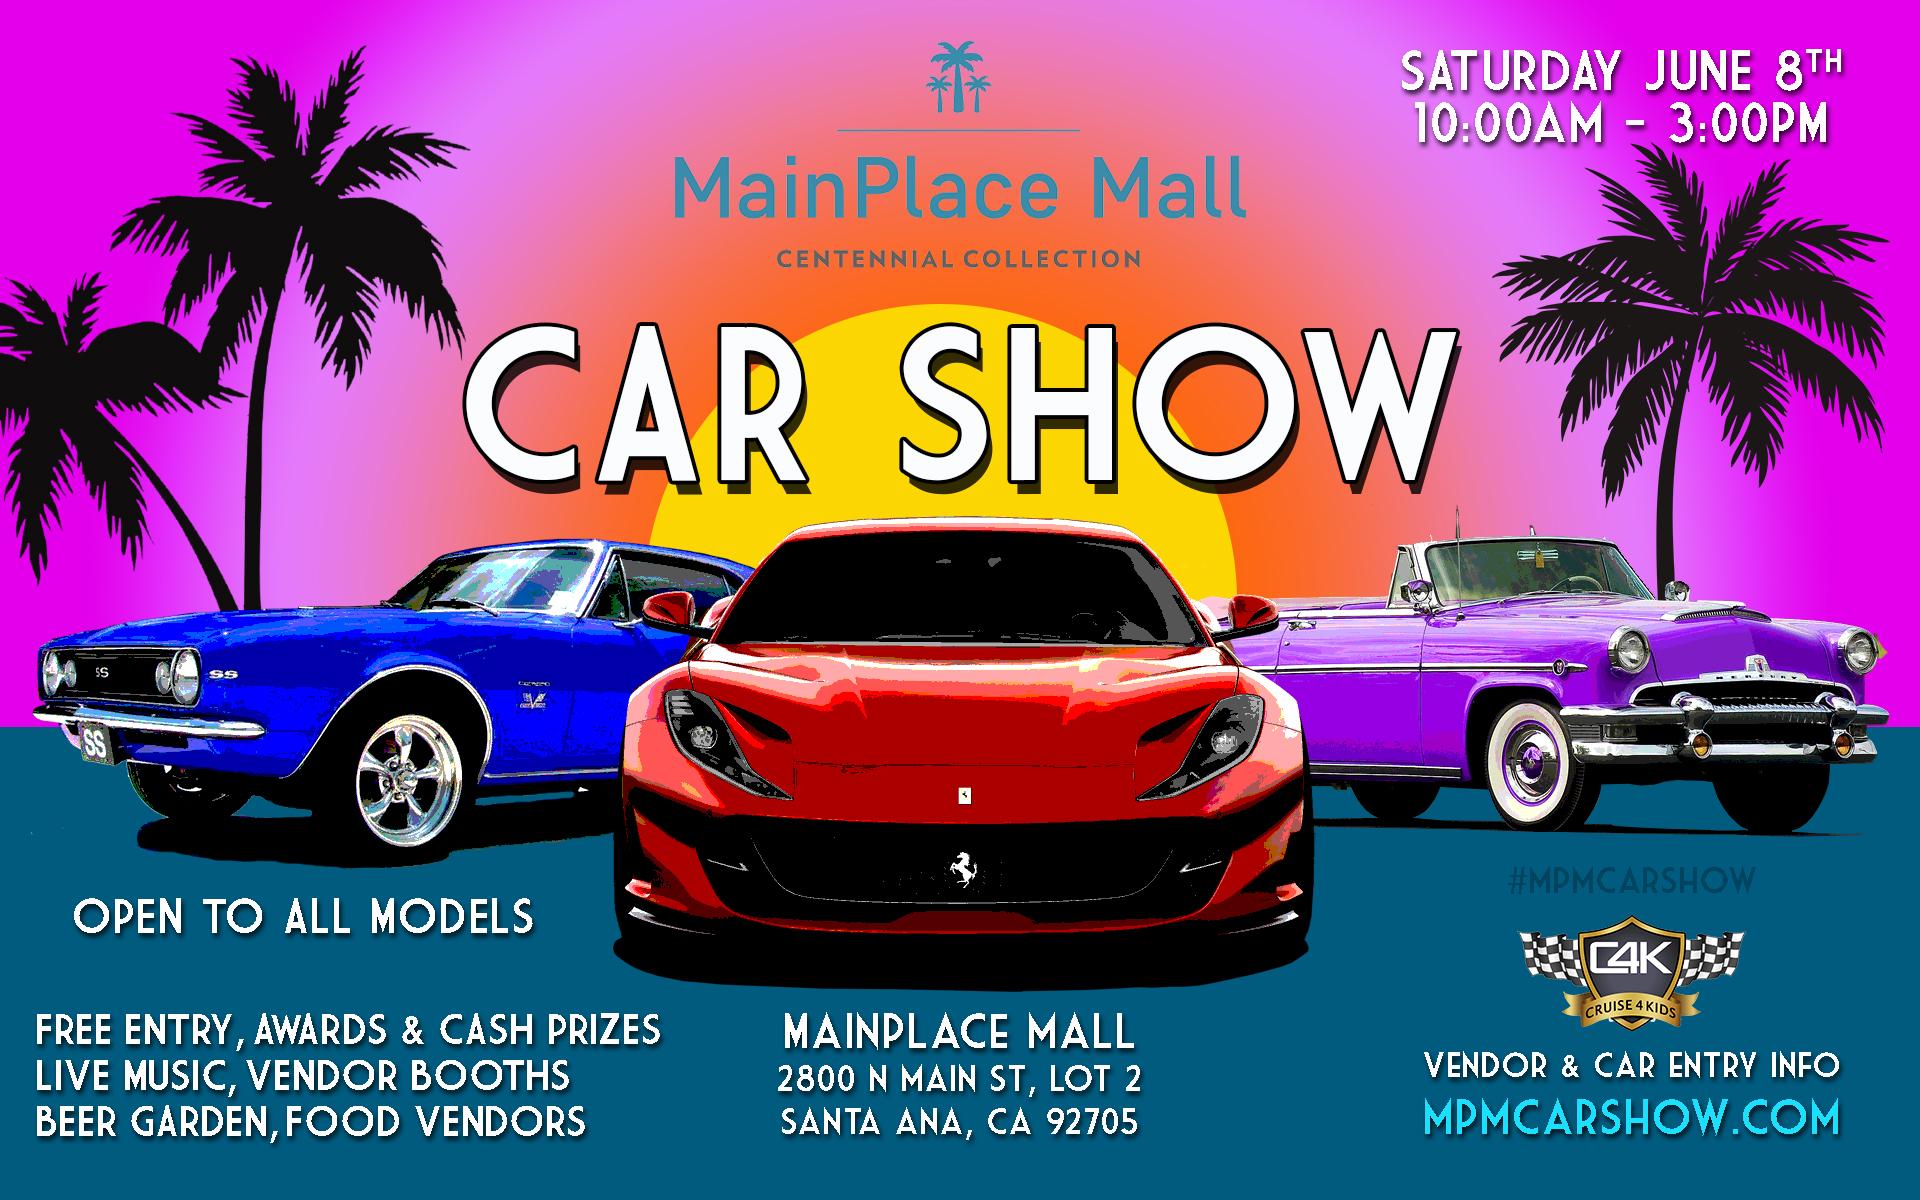 MainPlace Mall Car Show Flyer - June 8 - 3 cars.jpg